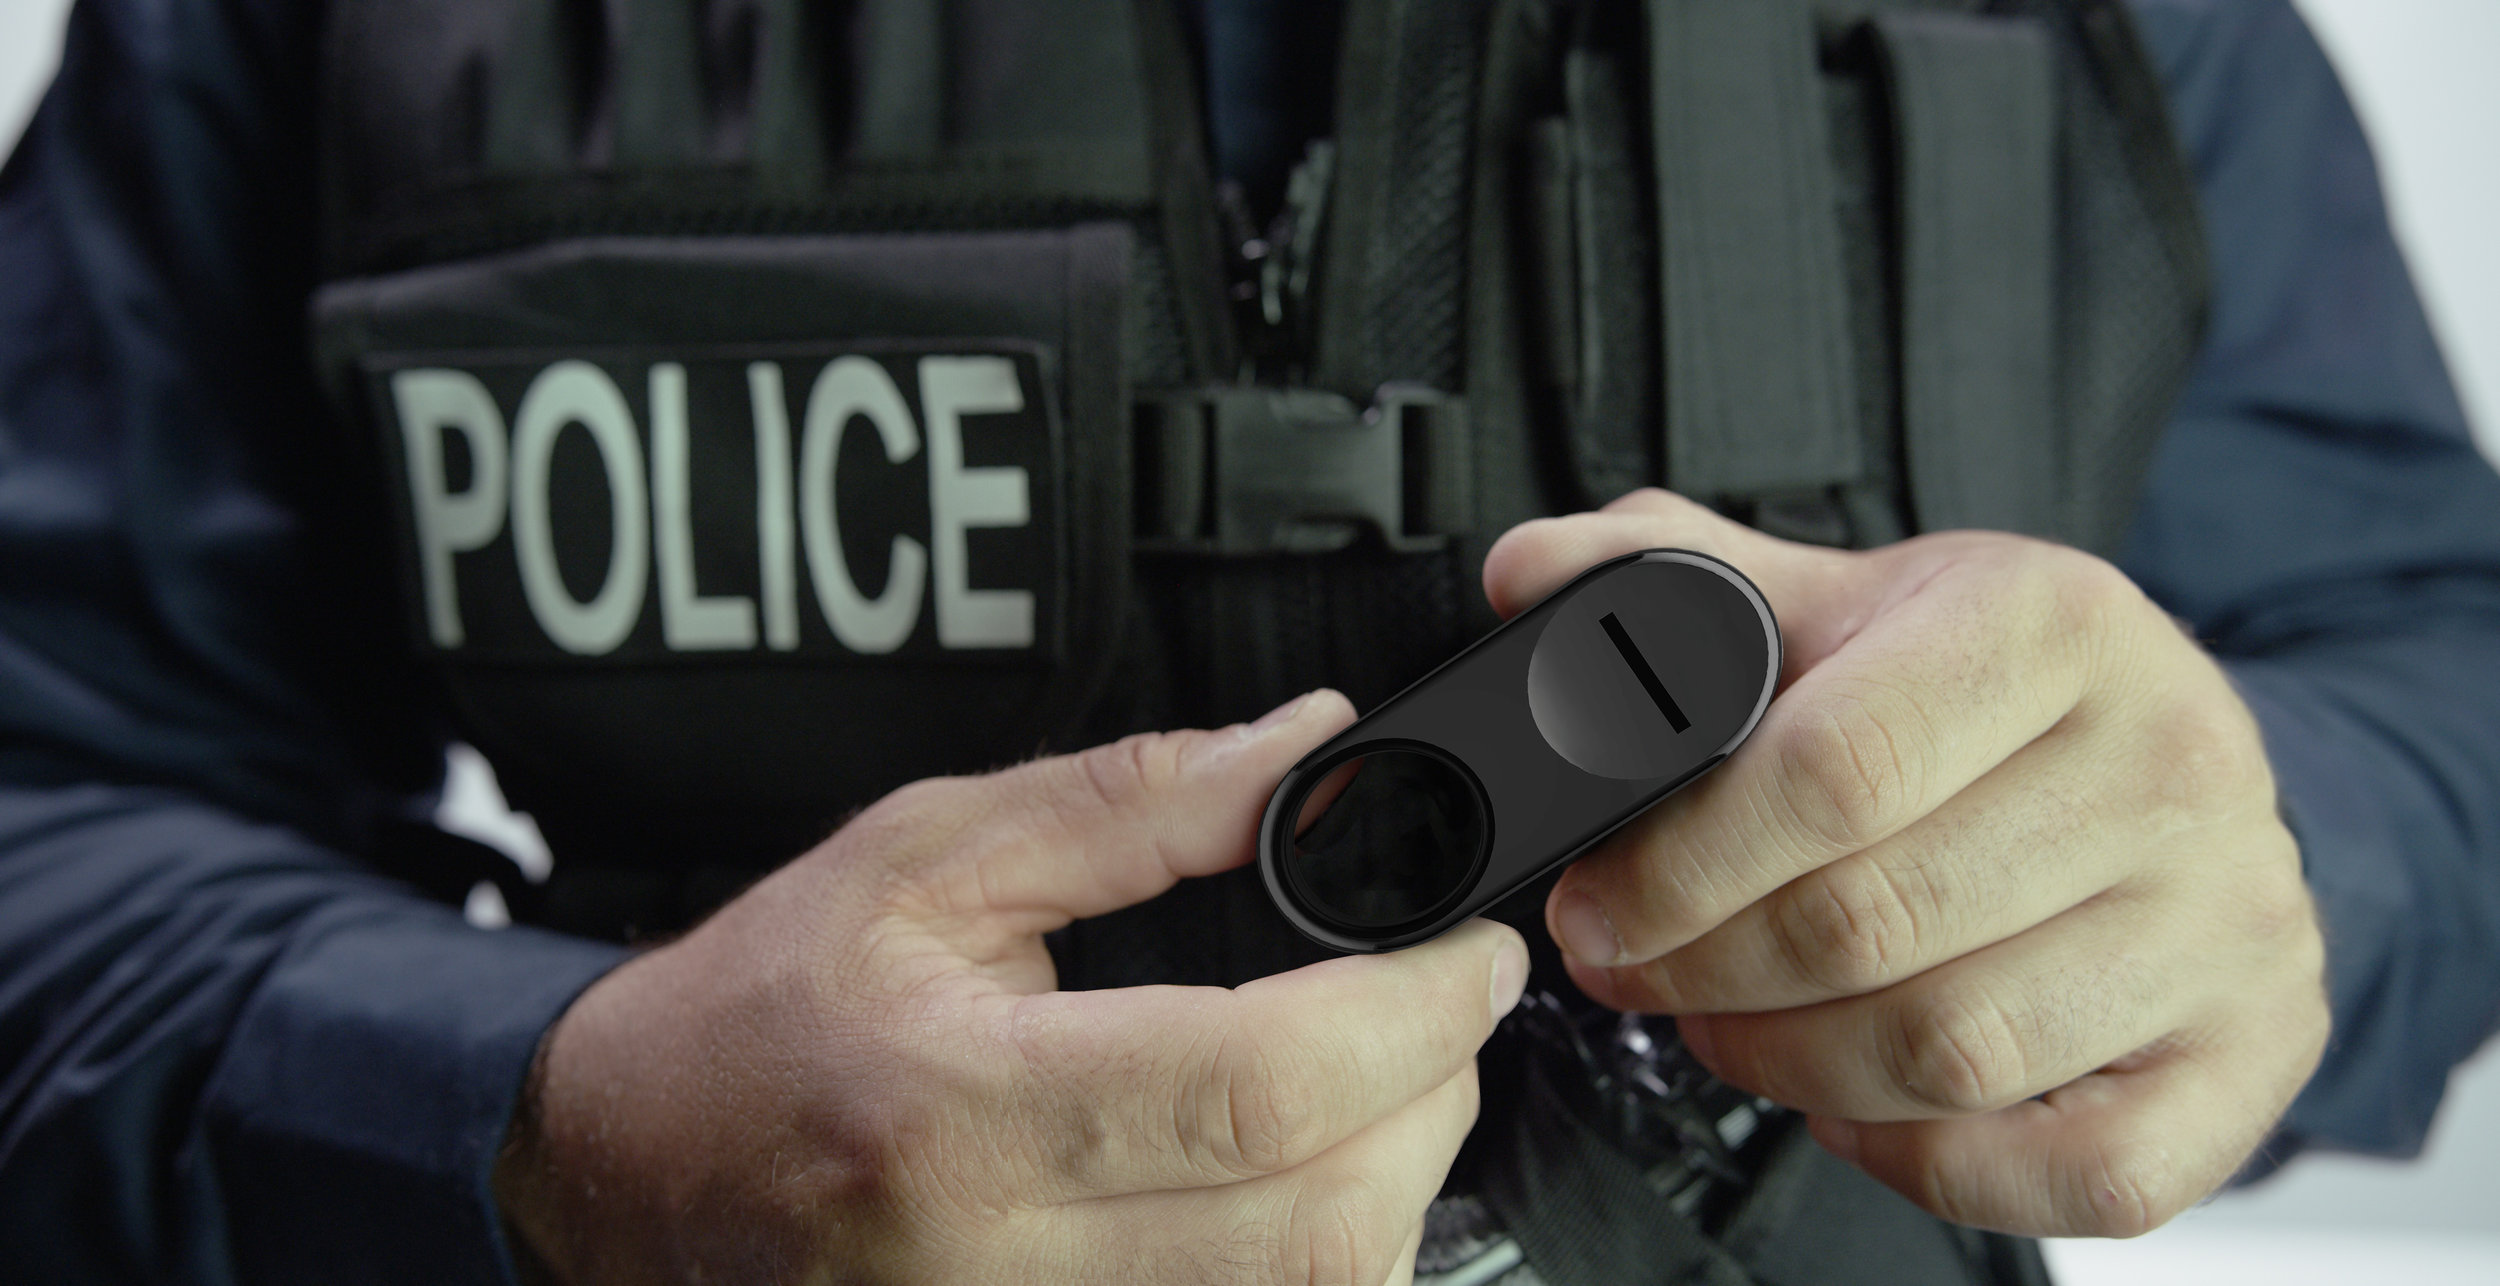 policefob1.jpg